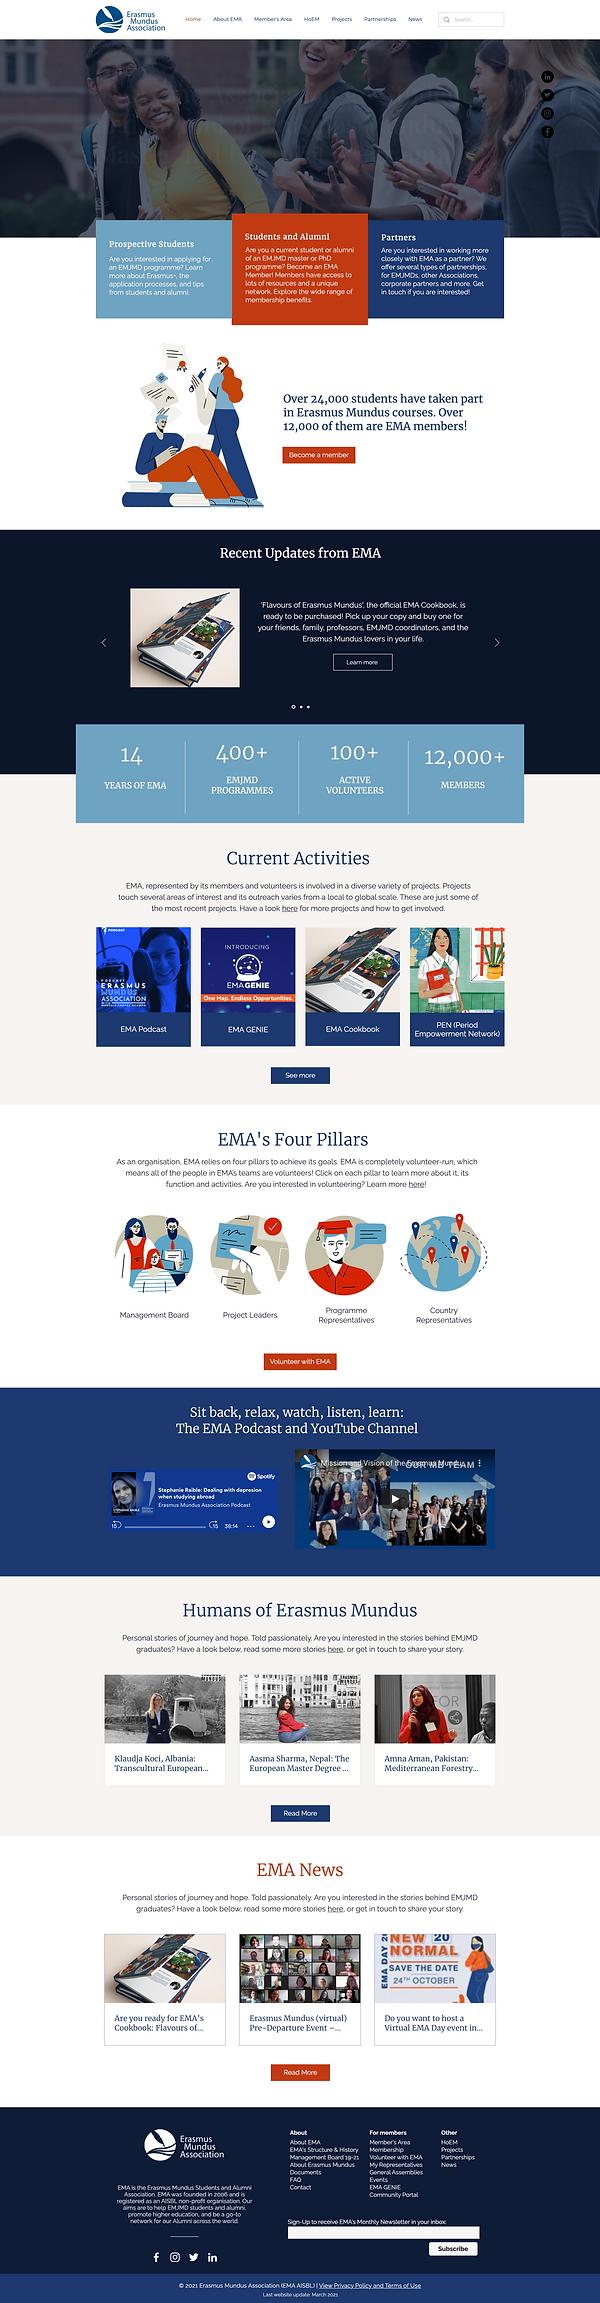 EMA website.png